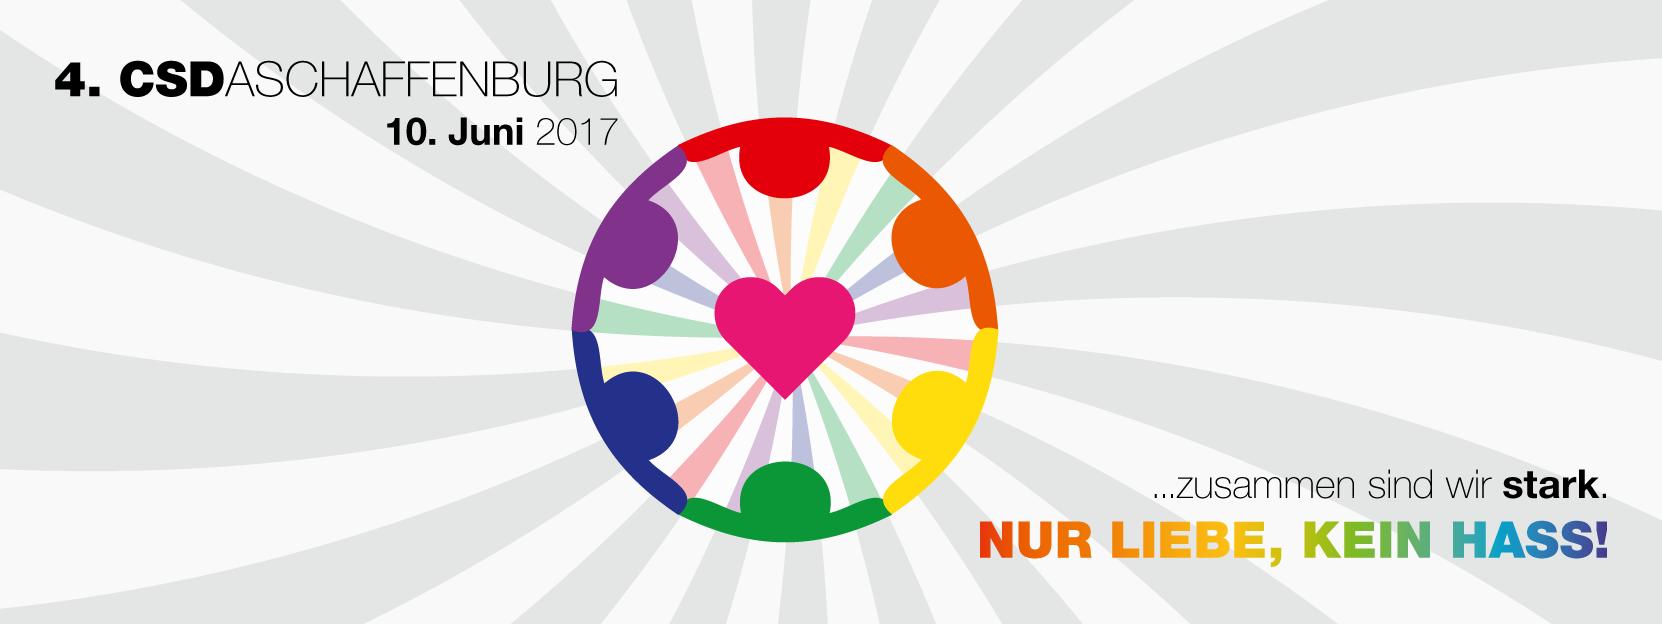 CSD Aschaffenburg - 2017